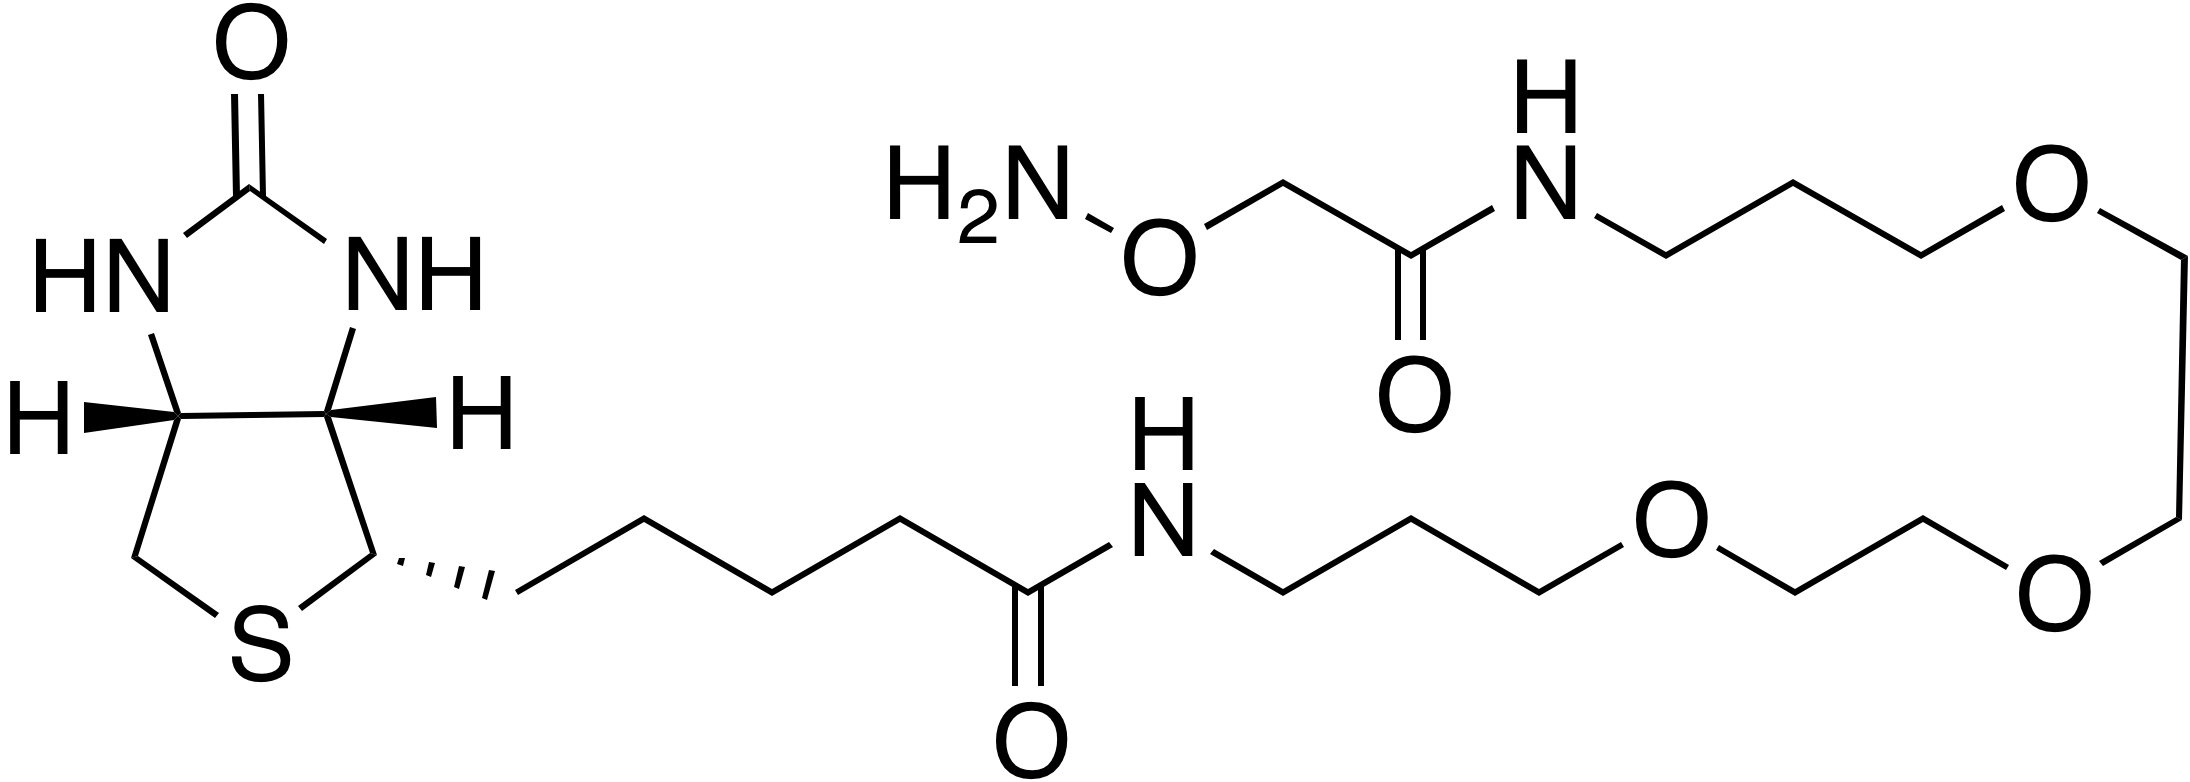 N-(1-(Aminooxy)-2-oxo-7,10,13-trioxa-3-azahexadecan-16-yl)-biotinamide